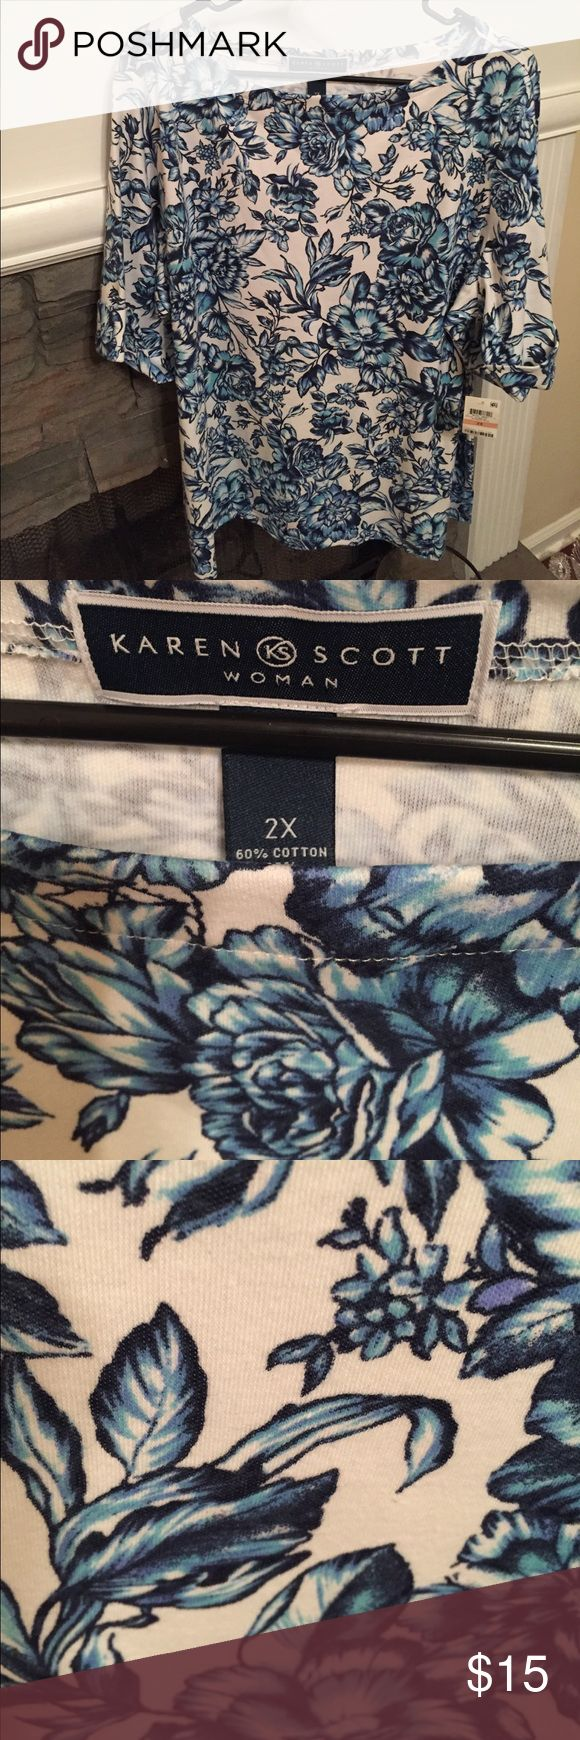 Karen Scott Woman's 2X Intrepid Blue Top NWT Karen Scott Woman's 2X intrepid blue with white background top. Cuffed sleeves, small side slits, boatneck. NWT Karen Scott Tops